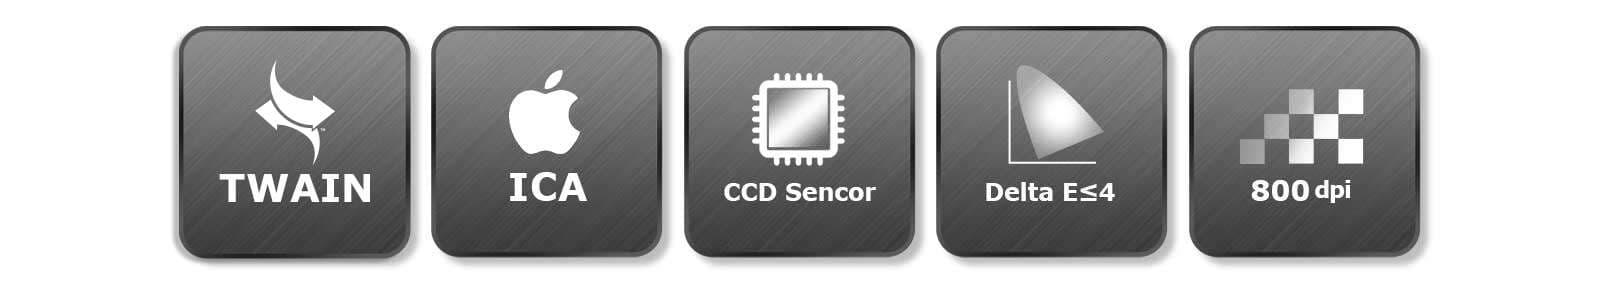 與WIA相容,與ICA相容,配備CCD,高色彩還原-DealtaE,高解析度-800 dpi